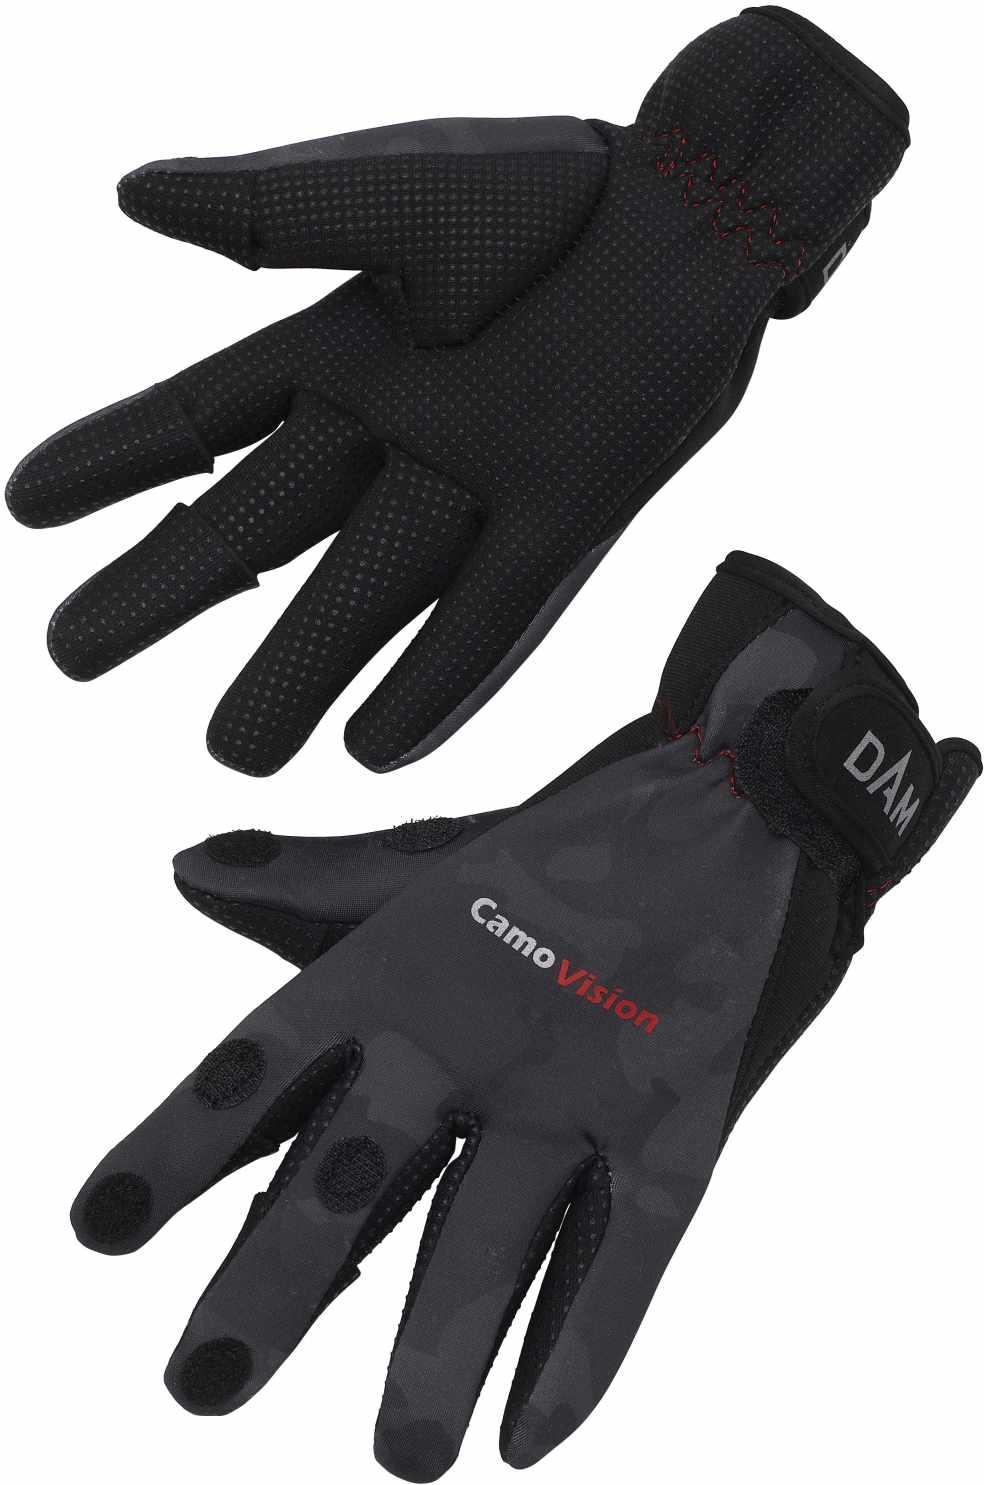 Angelsport DAM Handschuhe CamoVision NEO Glove XL Handschuhe